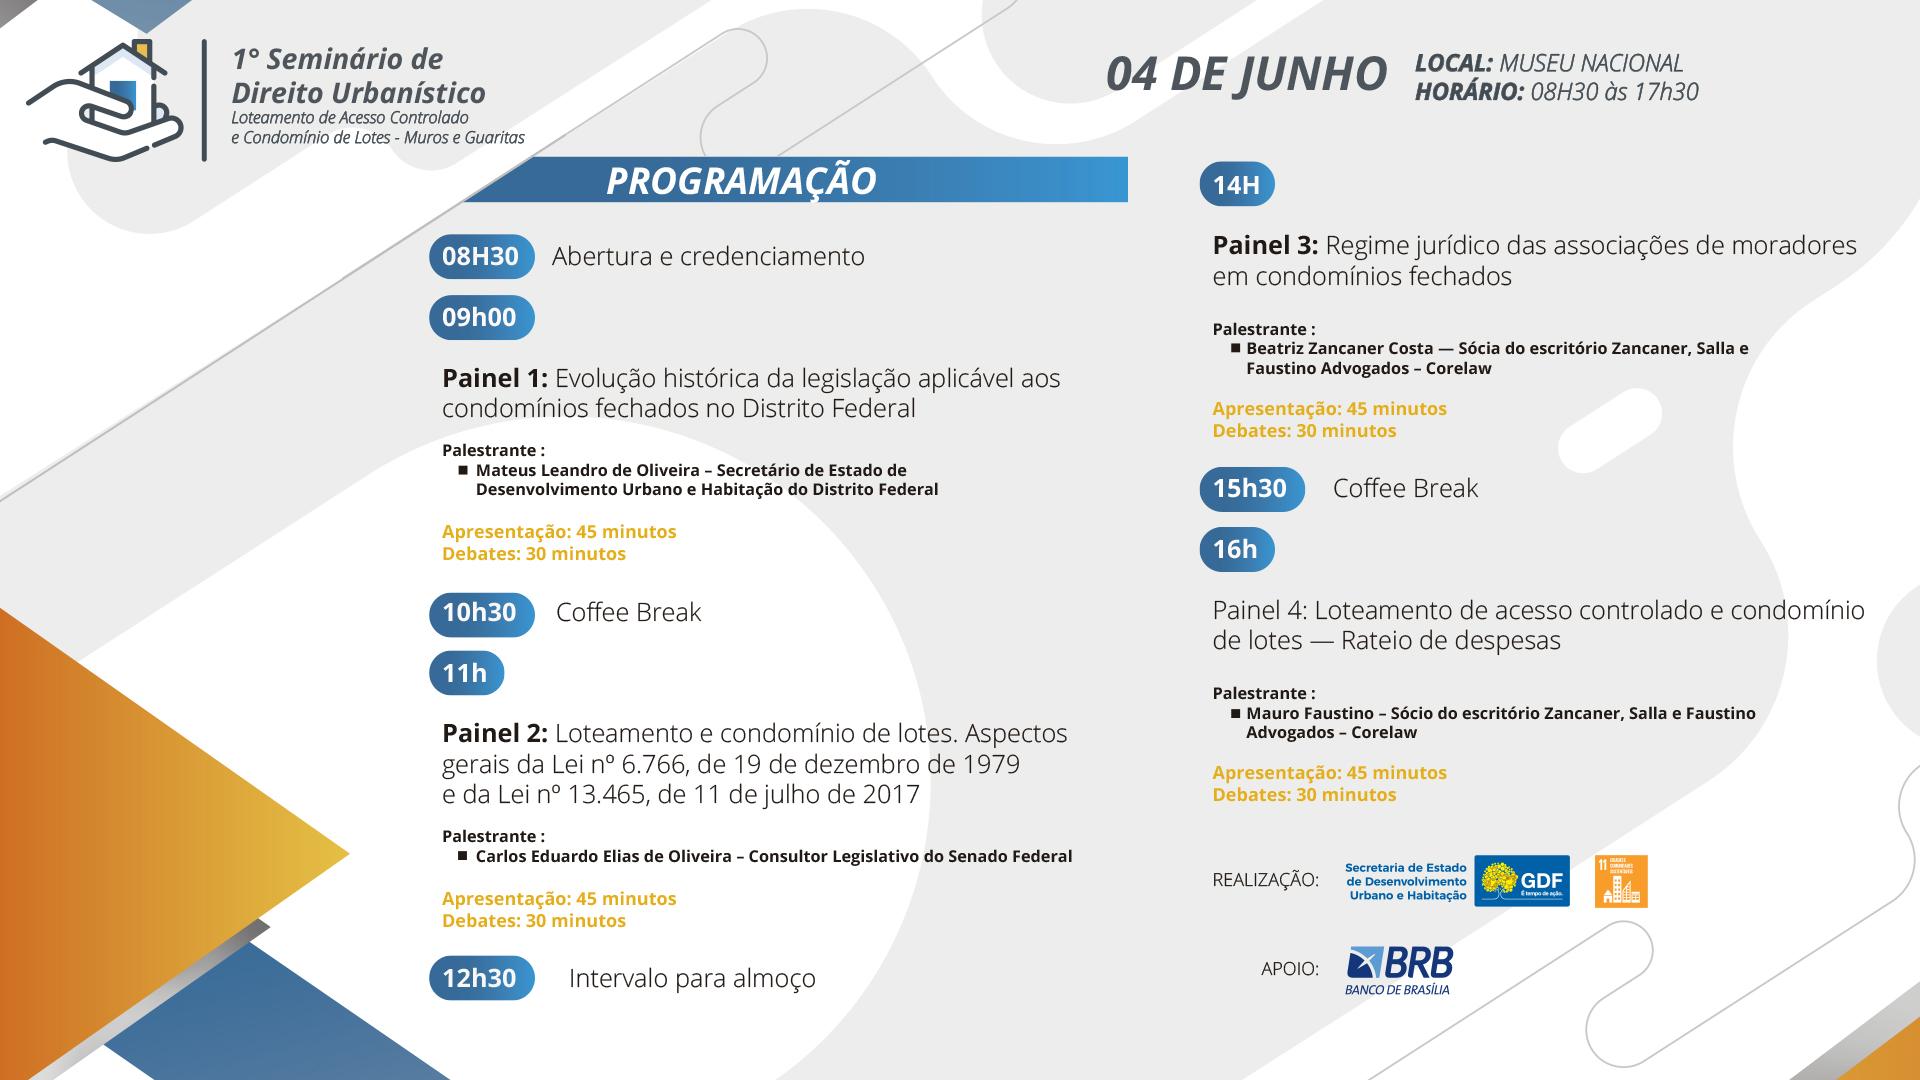 programacao-1.o-seminario-de-direito-urbanistico-4-de-junho-controle-de-acesso-condominios-muros-e-guaritas-museu-nacional-seduh-df